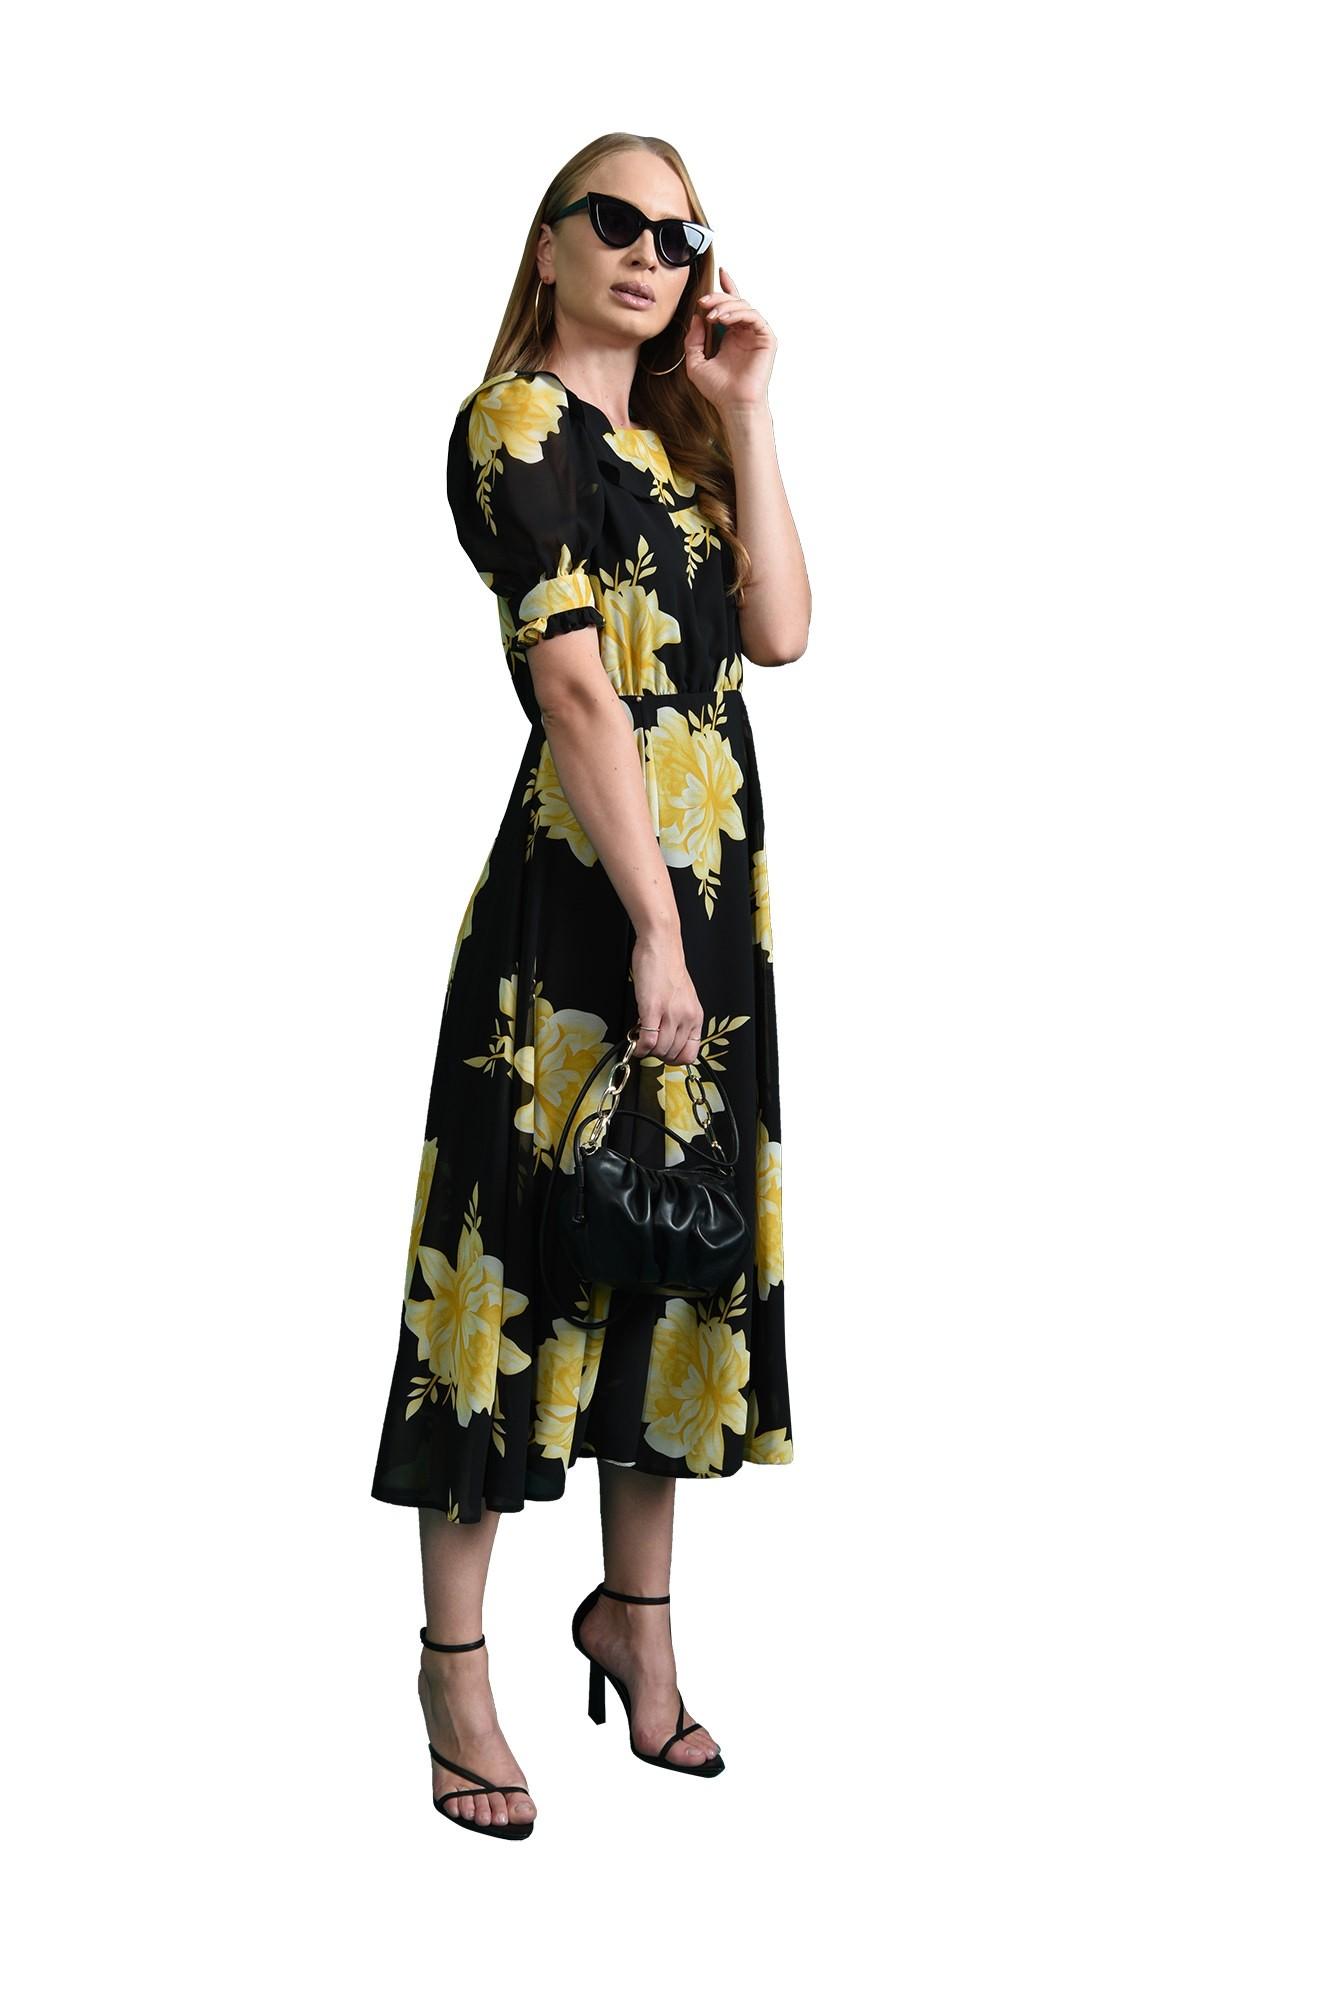 3 - rochie cu motive florale, evazata, Poema